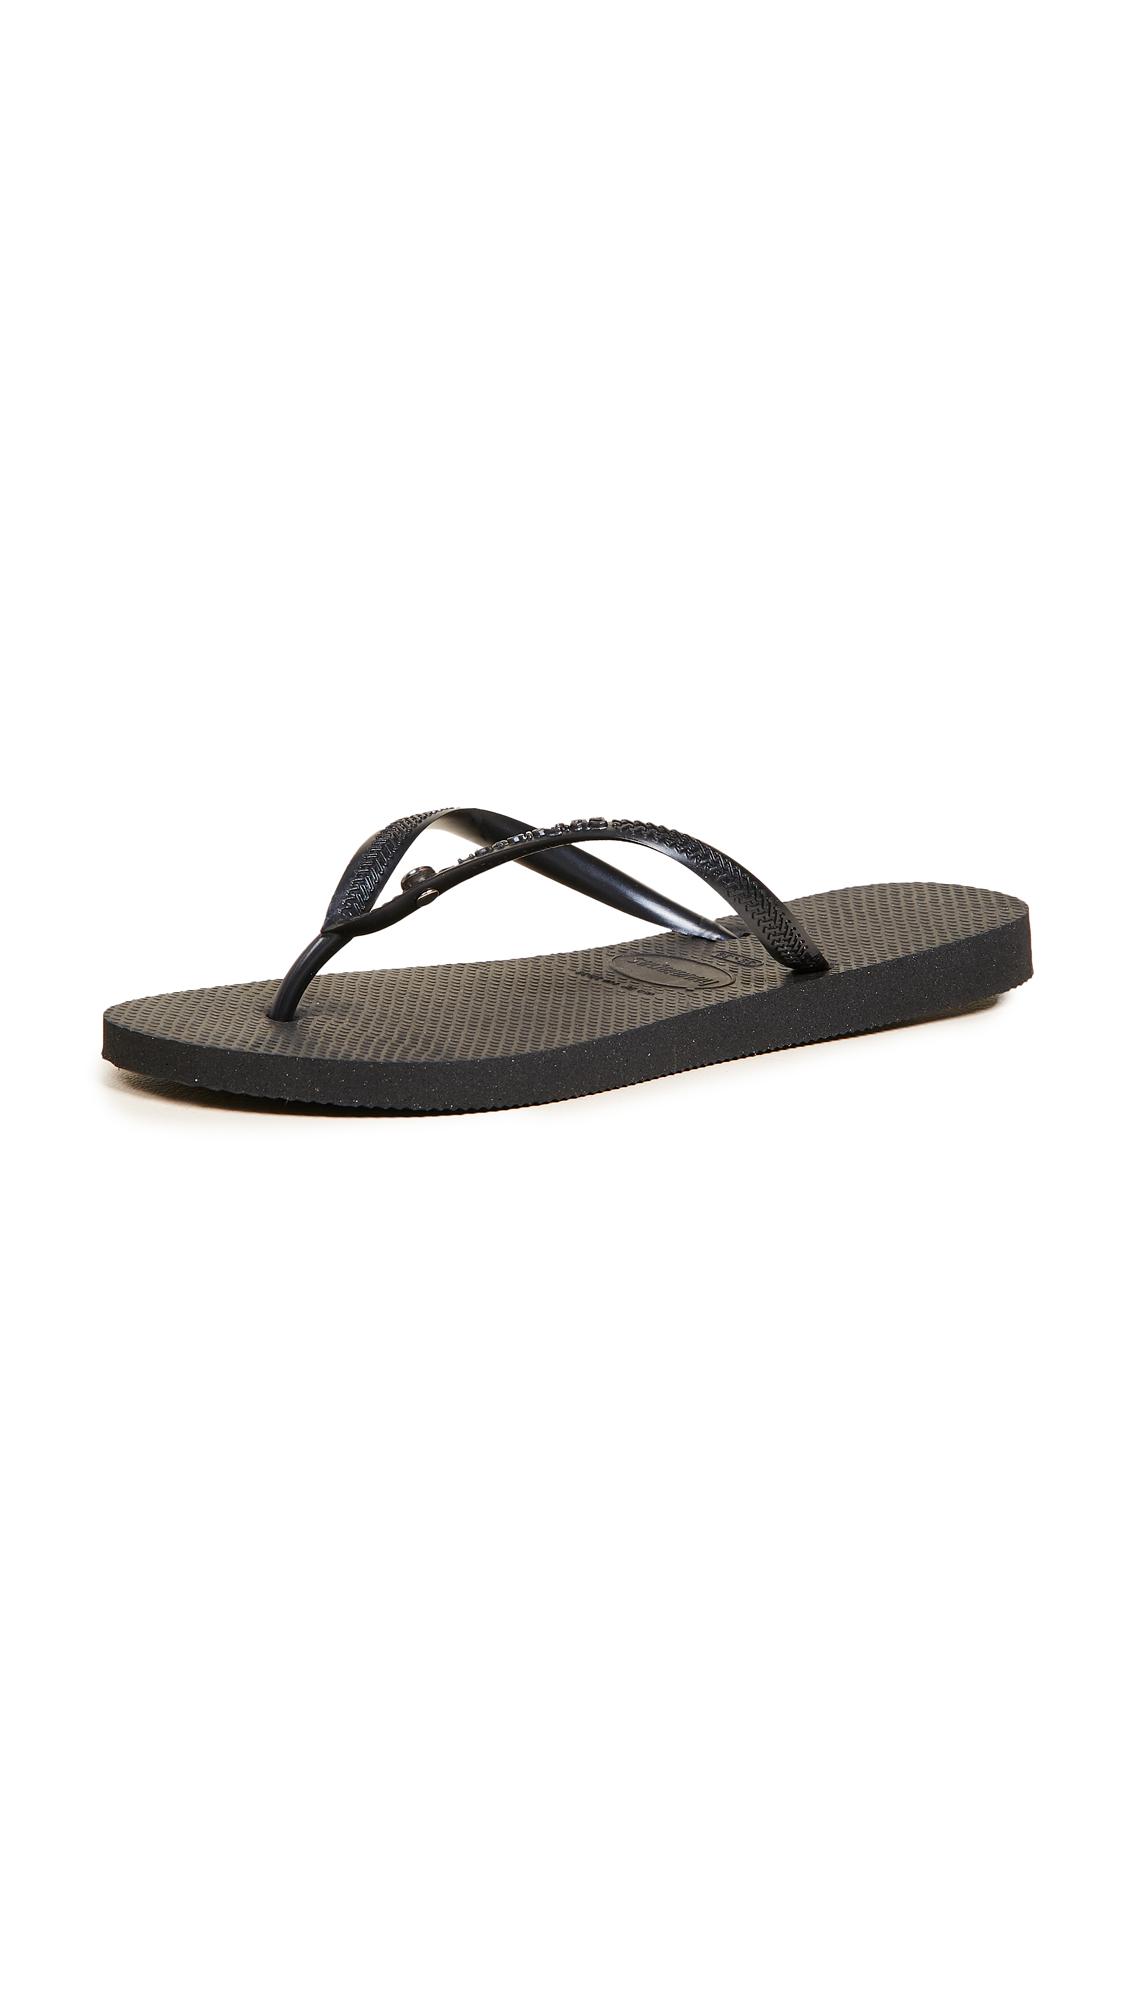 Havaianas Slim Crystal Glamour Flip Flops - Black